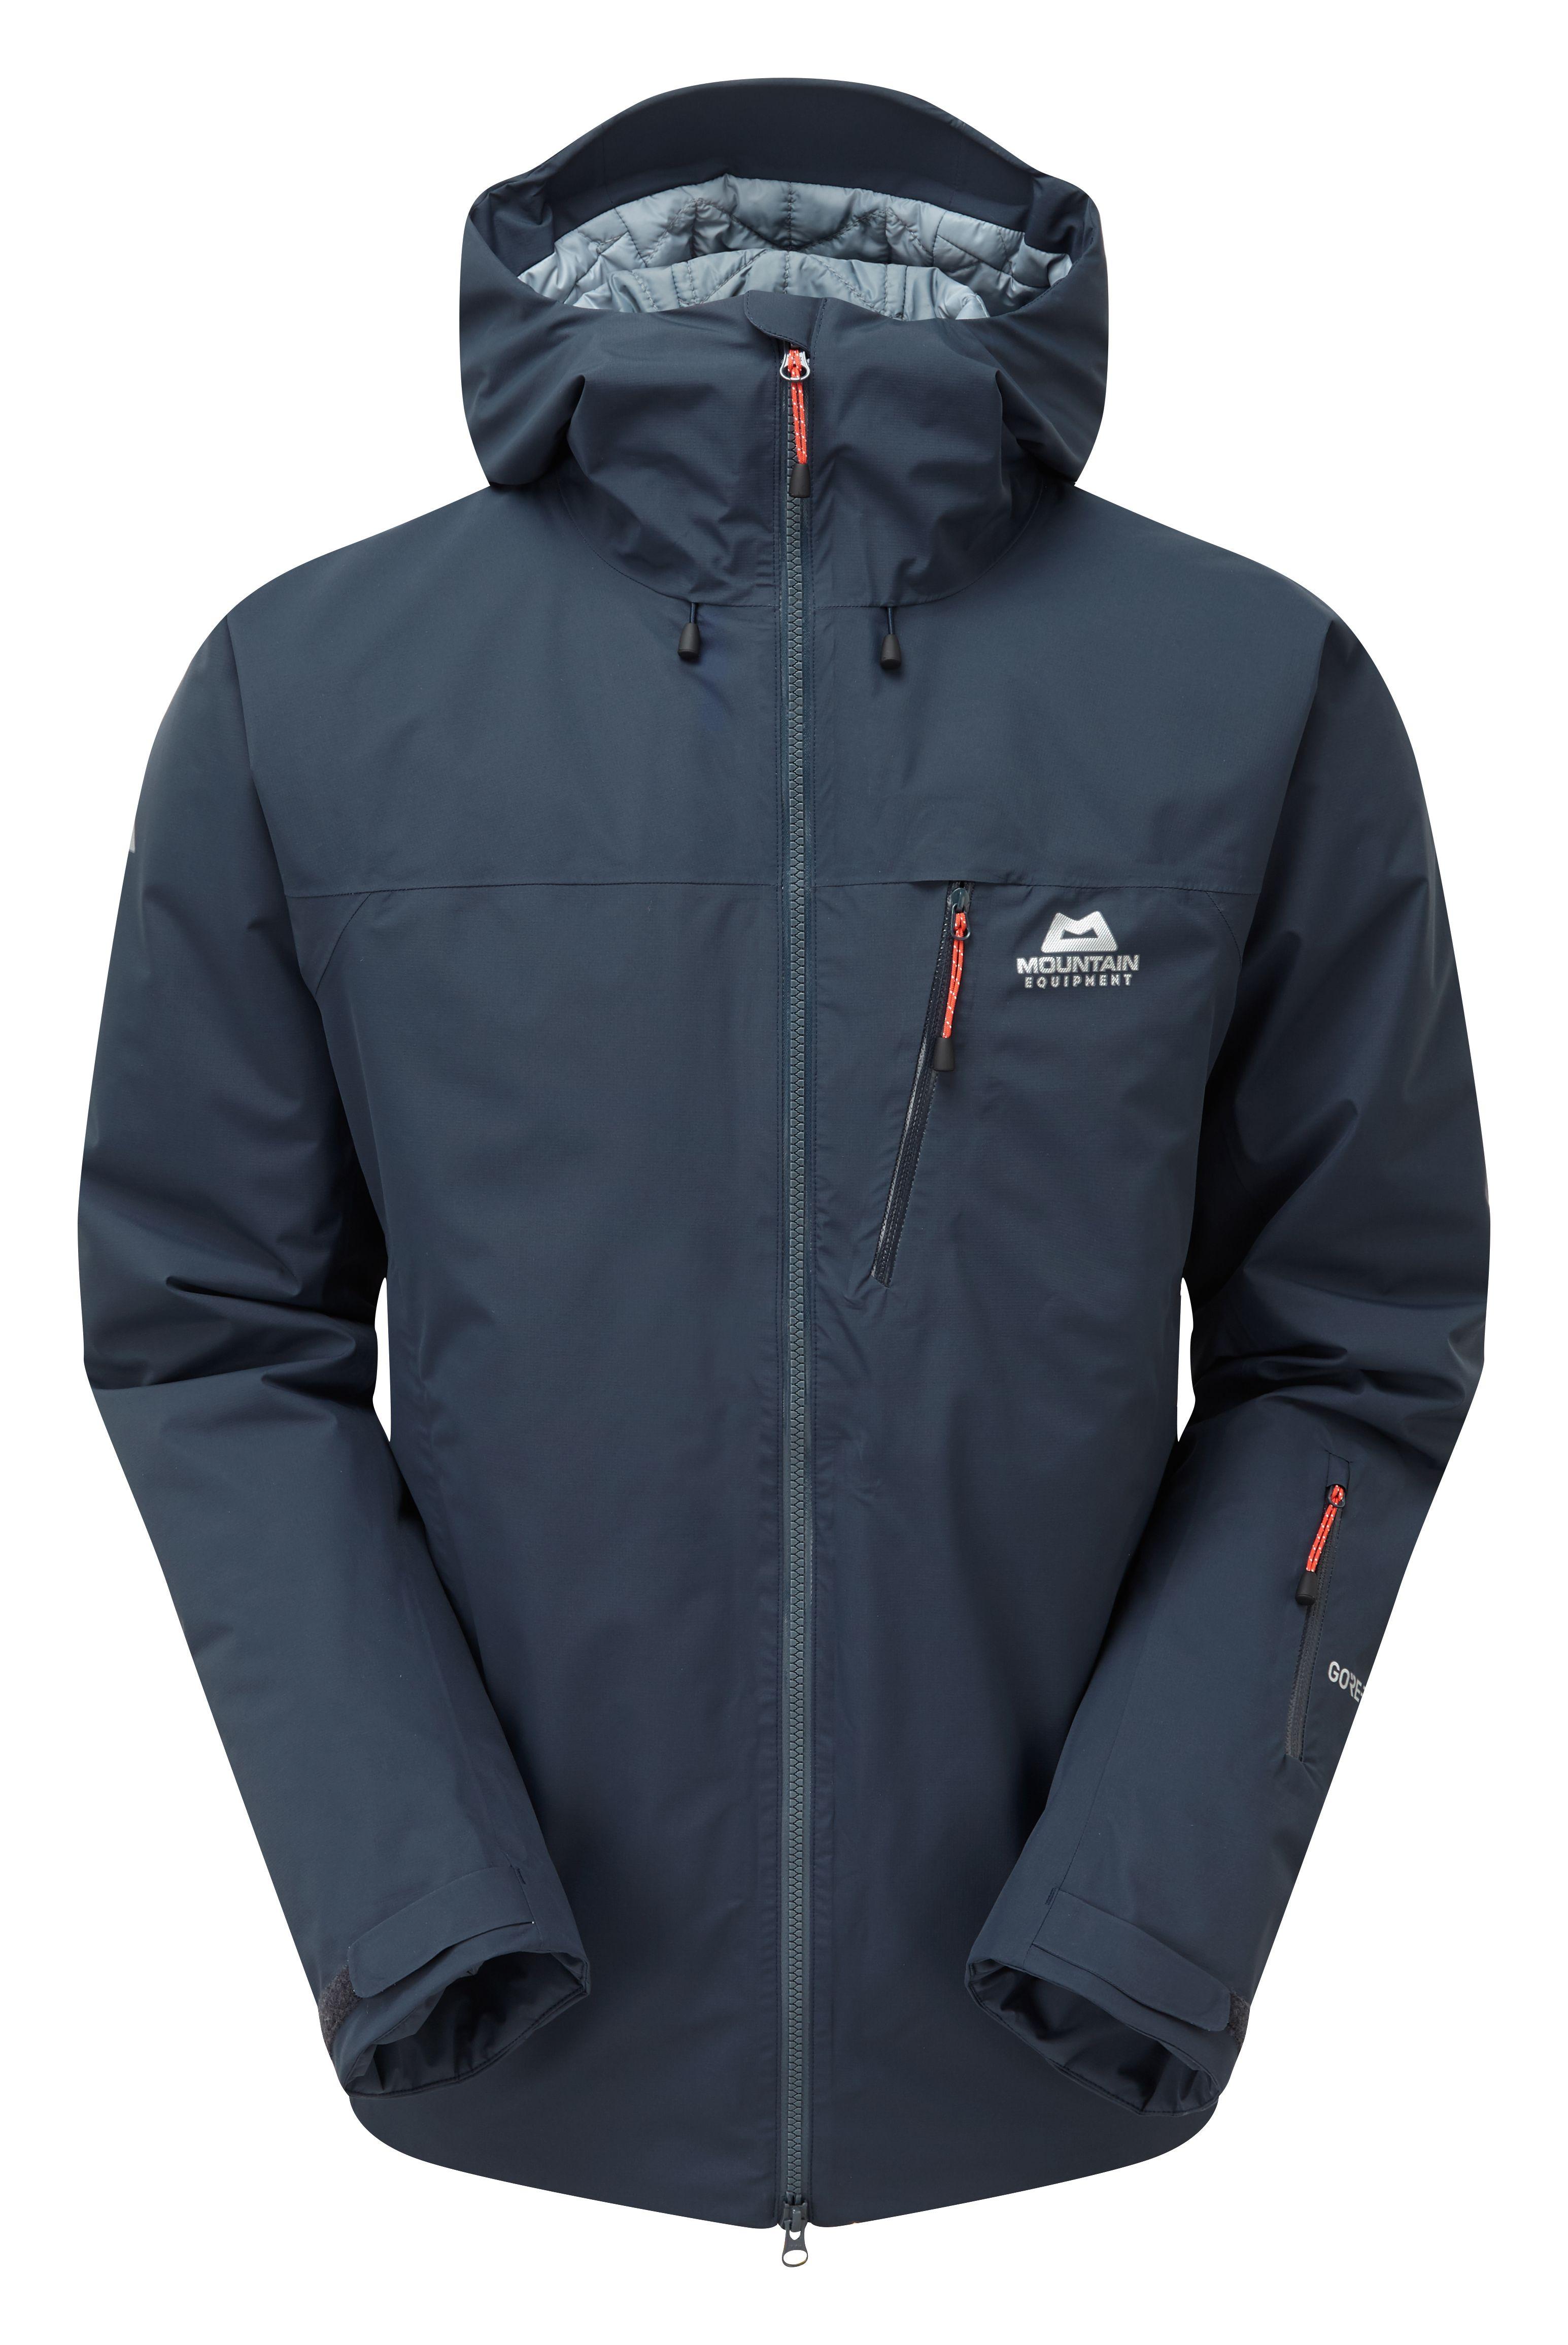 Mountain Equipment Kore Hooded Jacket Fleece Small Graphite